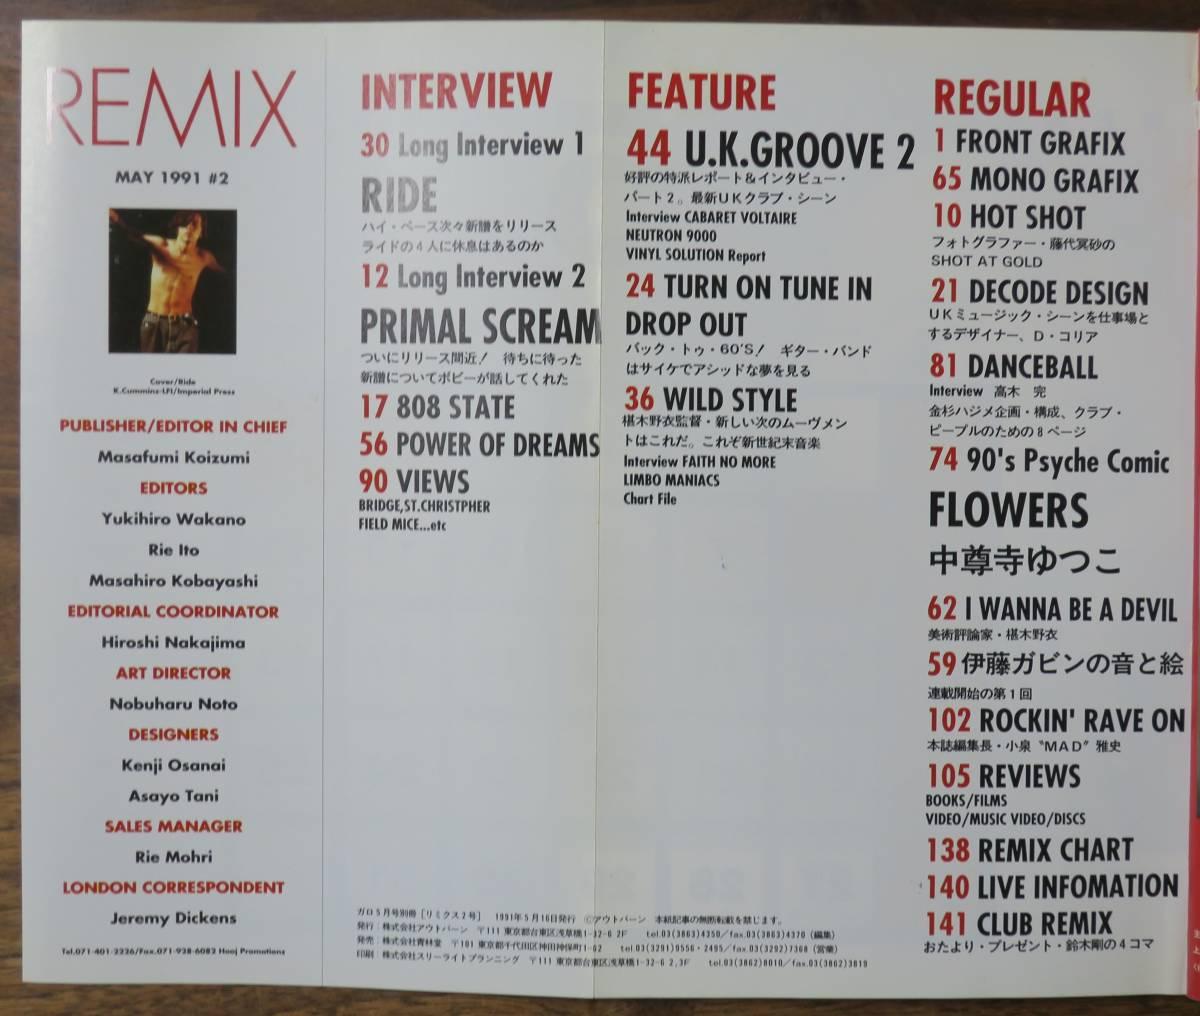 remix#2号PRIMAL SCREAM1991RIDE5FAITH NO MORE808STATELimbomaniacsNEUTRON9000CABARET VOLTAIRE高木完POWER OF DREAMS/FIELD MICE/BRIDGE_画像2